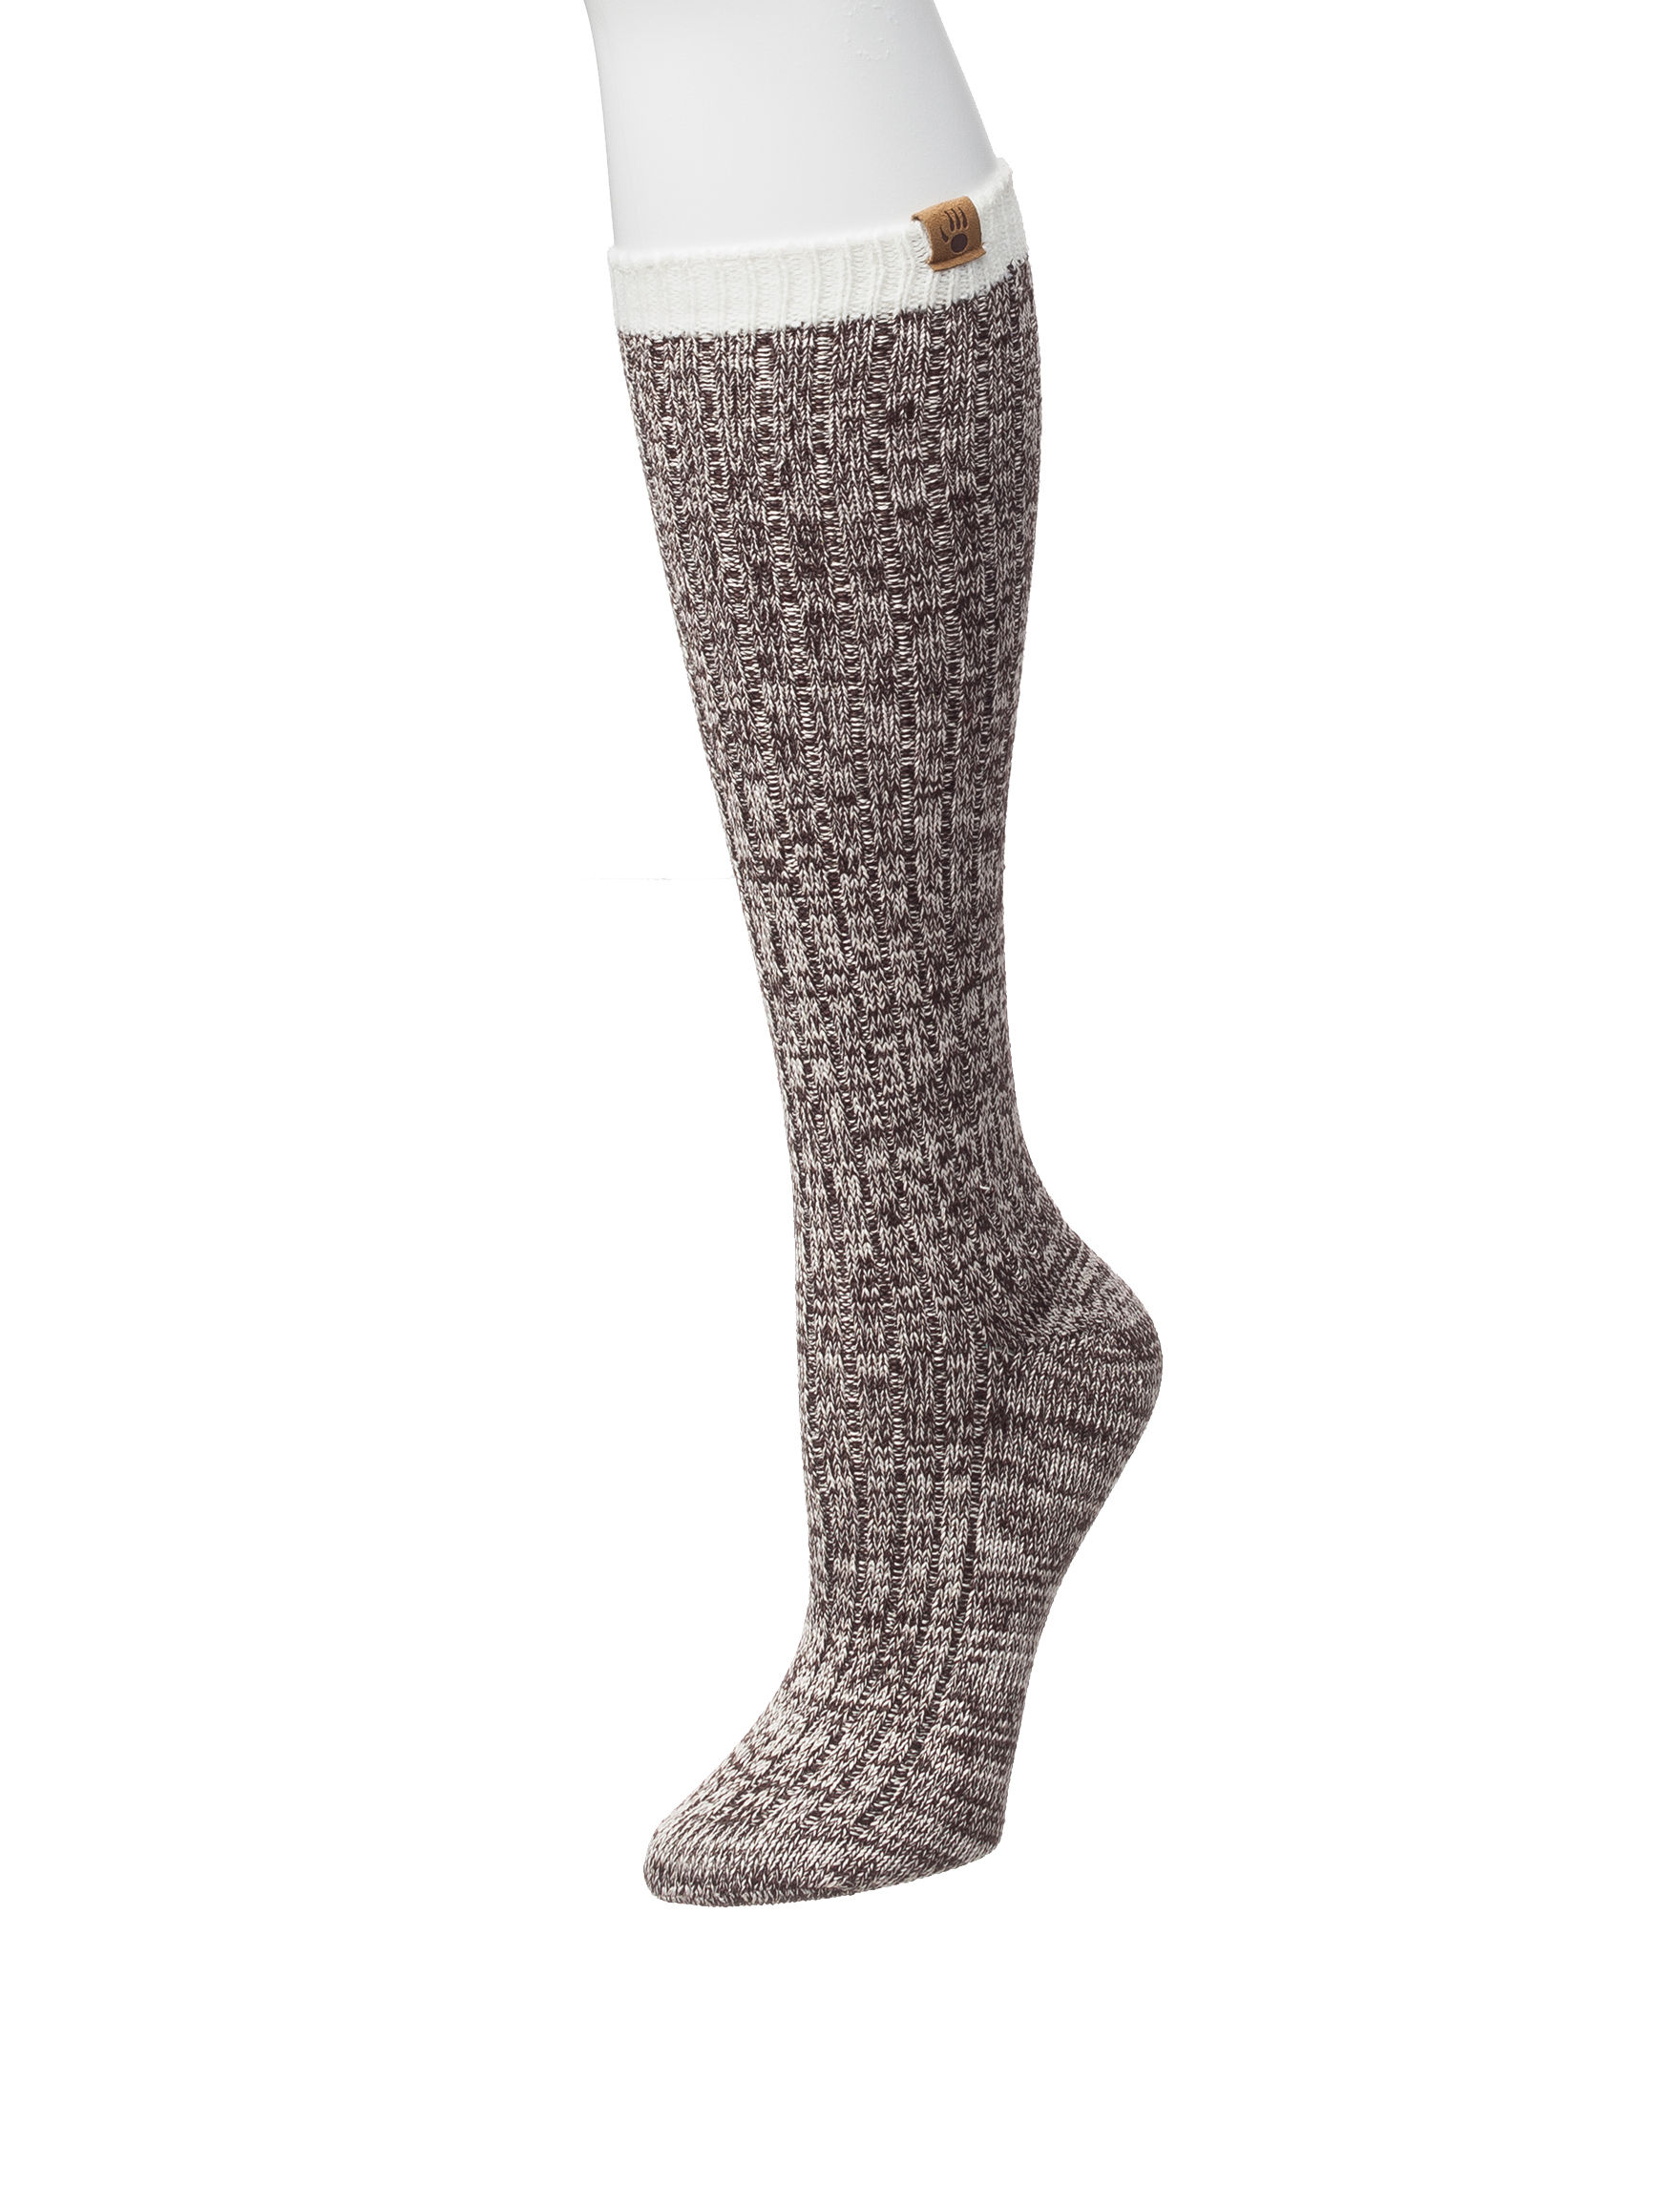 Bearpaw Black Socks